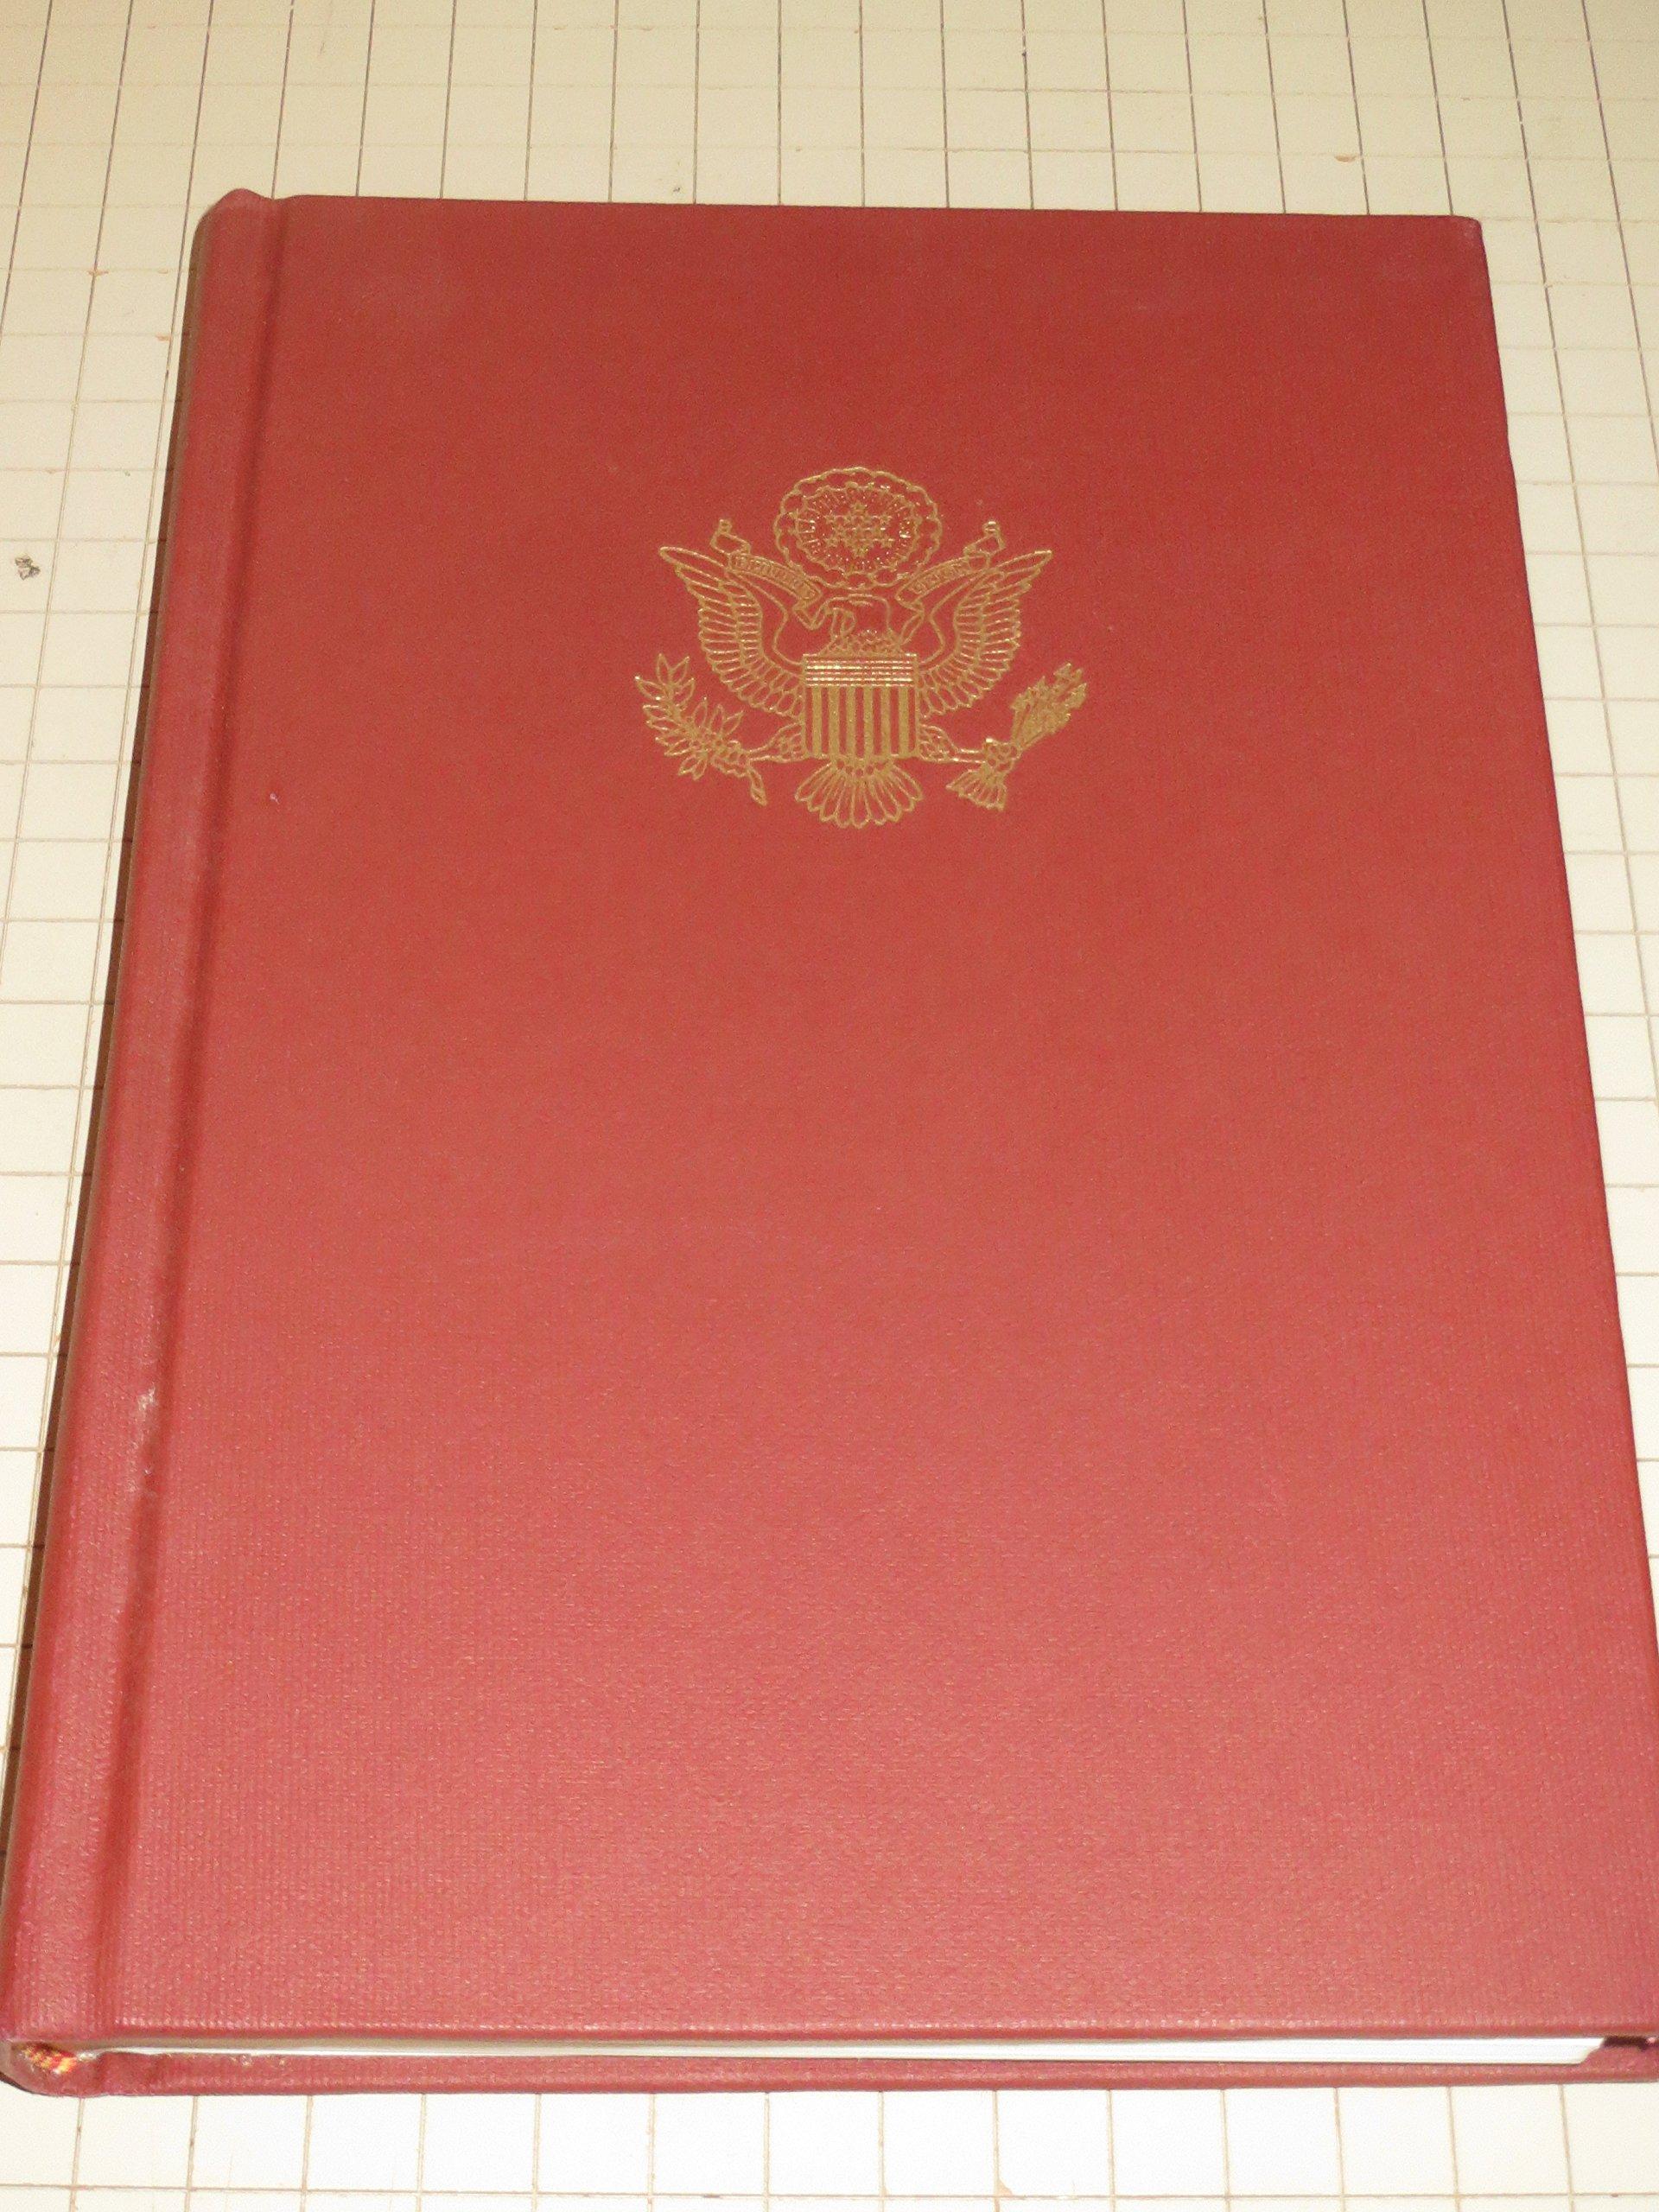 Army Historical Series: Eyes of Artillery: The Origins of Modern U.S. Army Aviation in World War II pdf